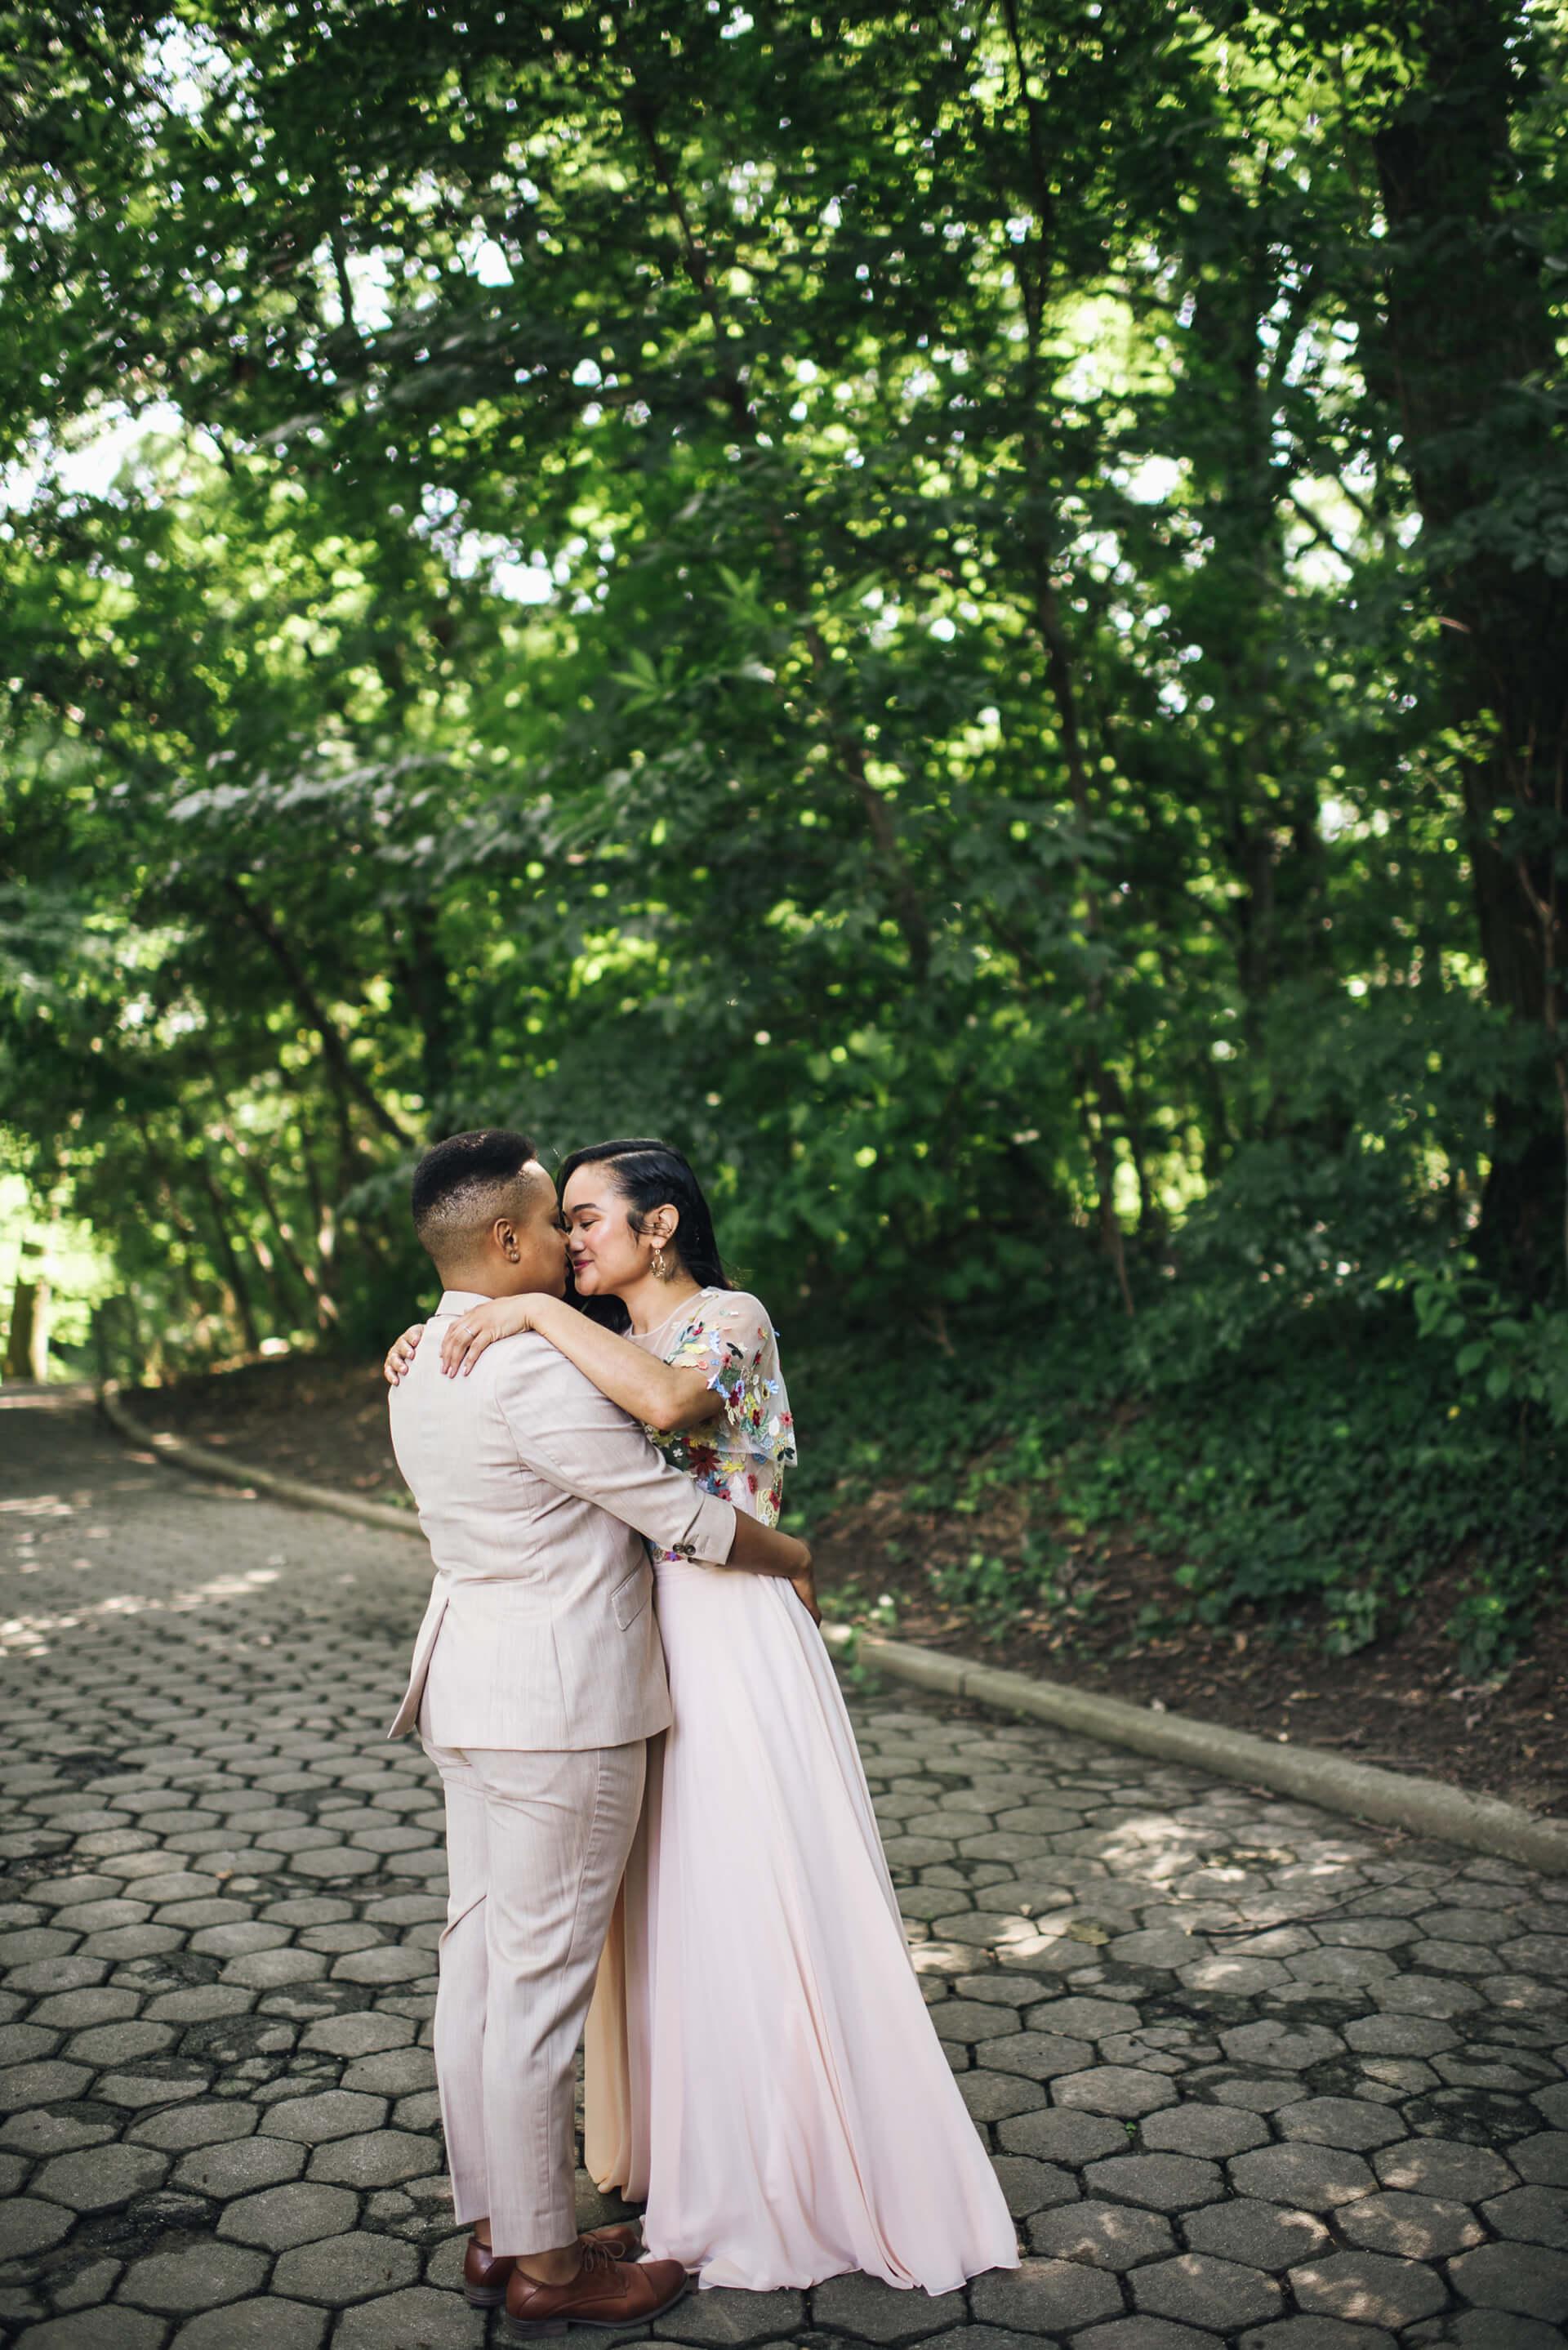 BROOKLYN SOCIETY FOR ETHICAL CULTURE - INTIMATE WEDDING - CHI-CHI ARI-91.jpg